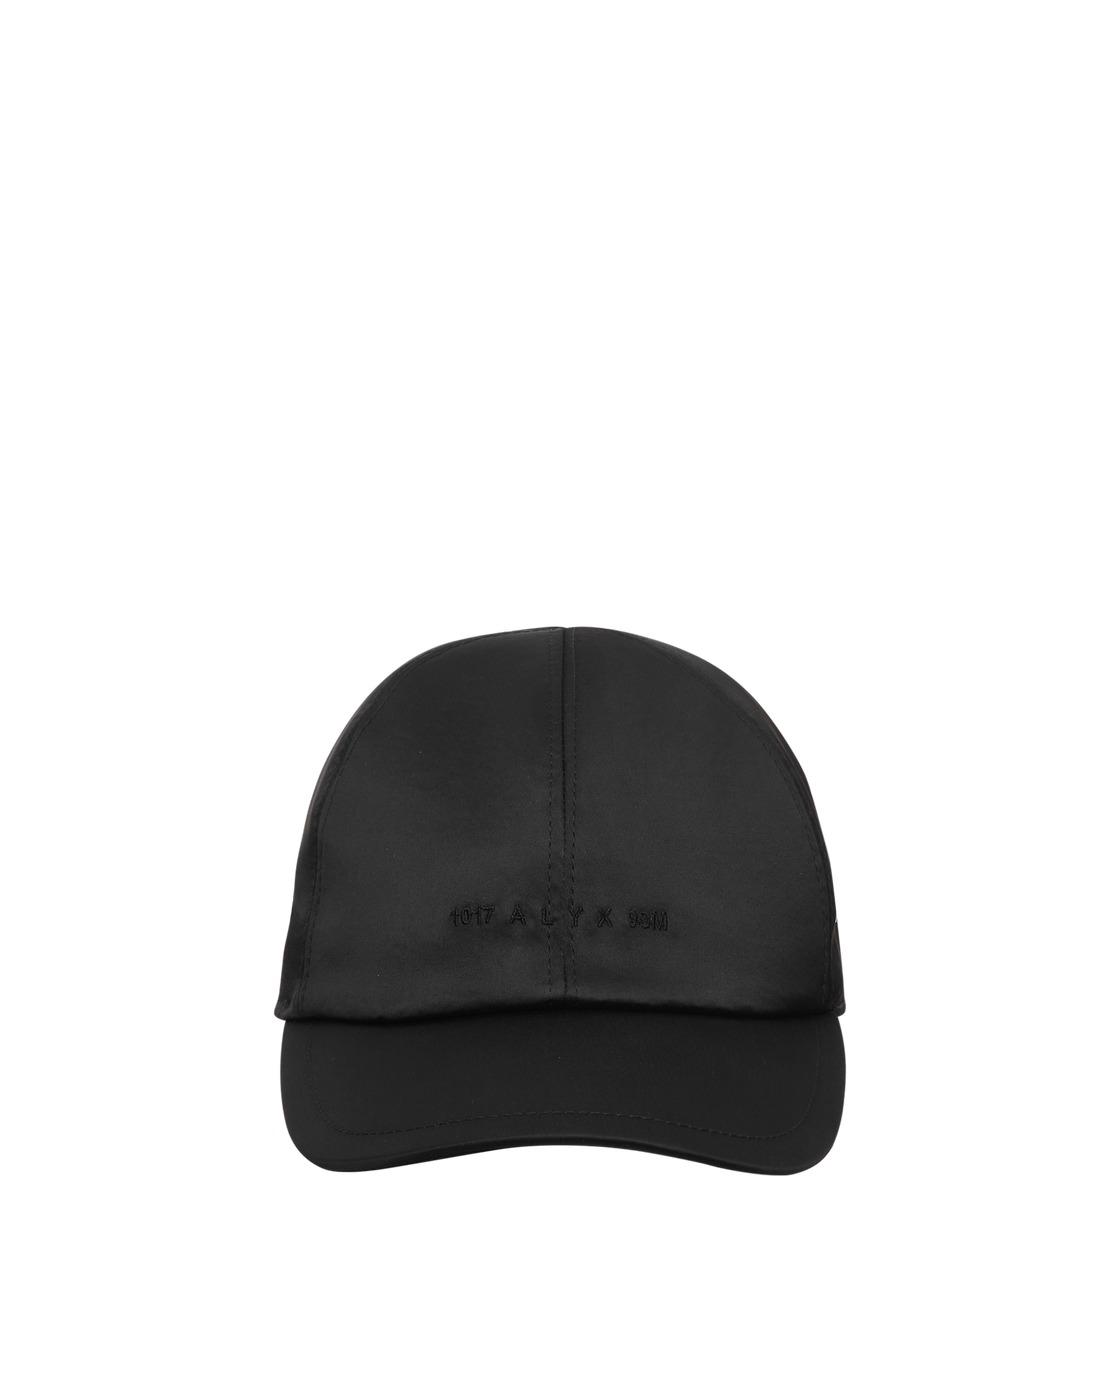 Photo: 1017 Alyx 9sm Satin Logo Buckle Cap Black